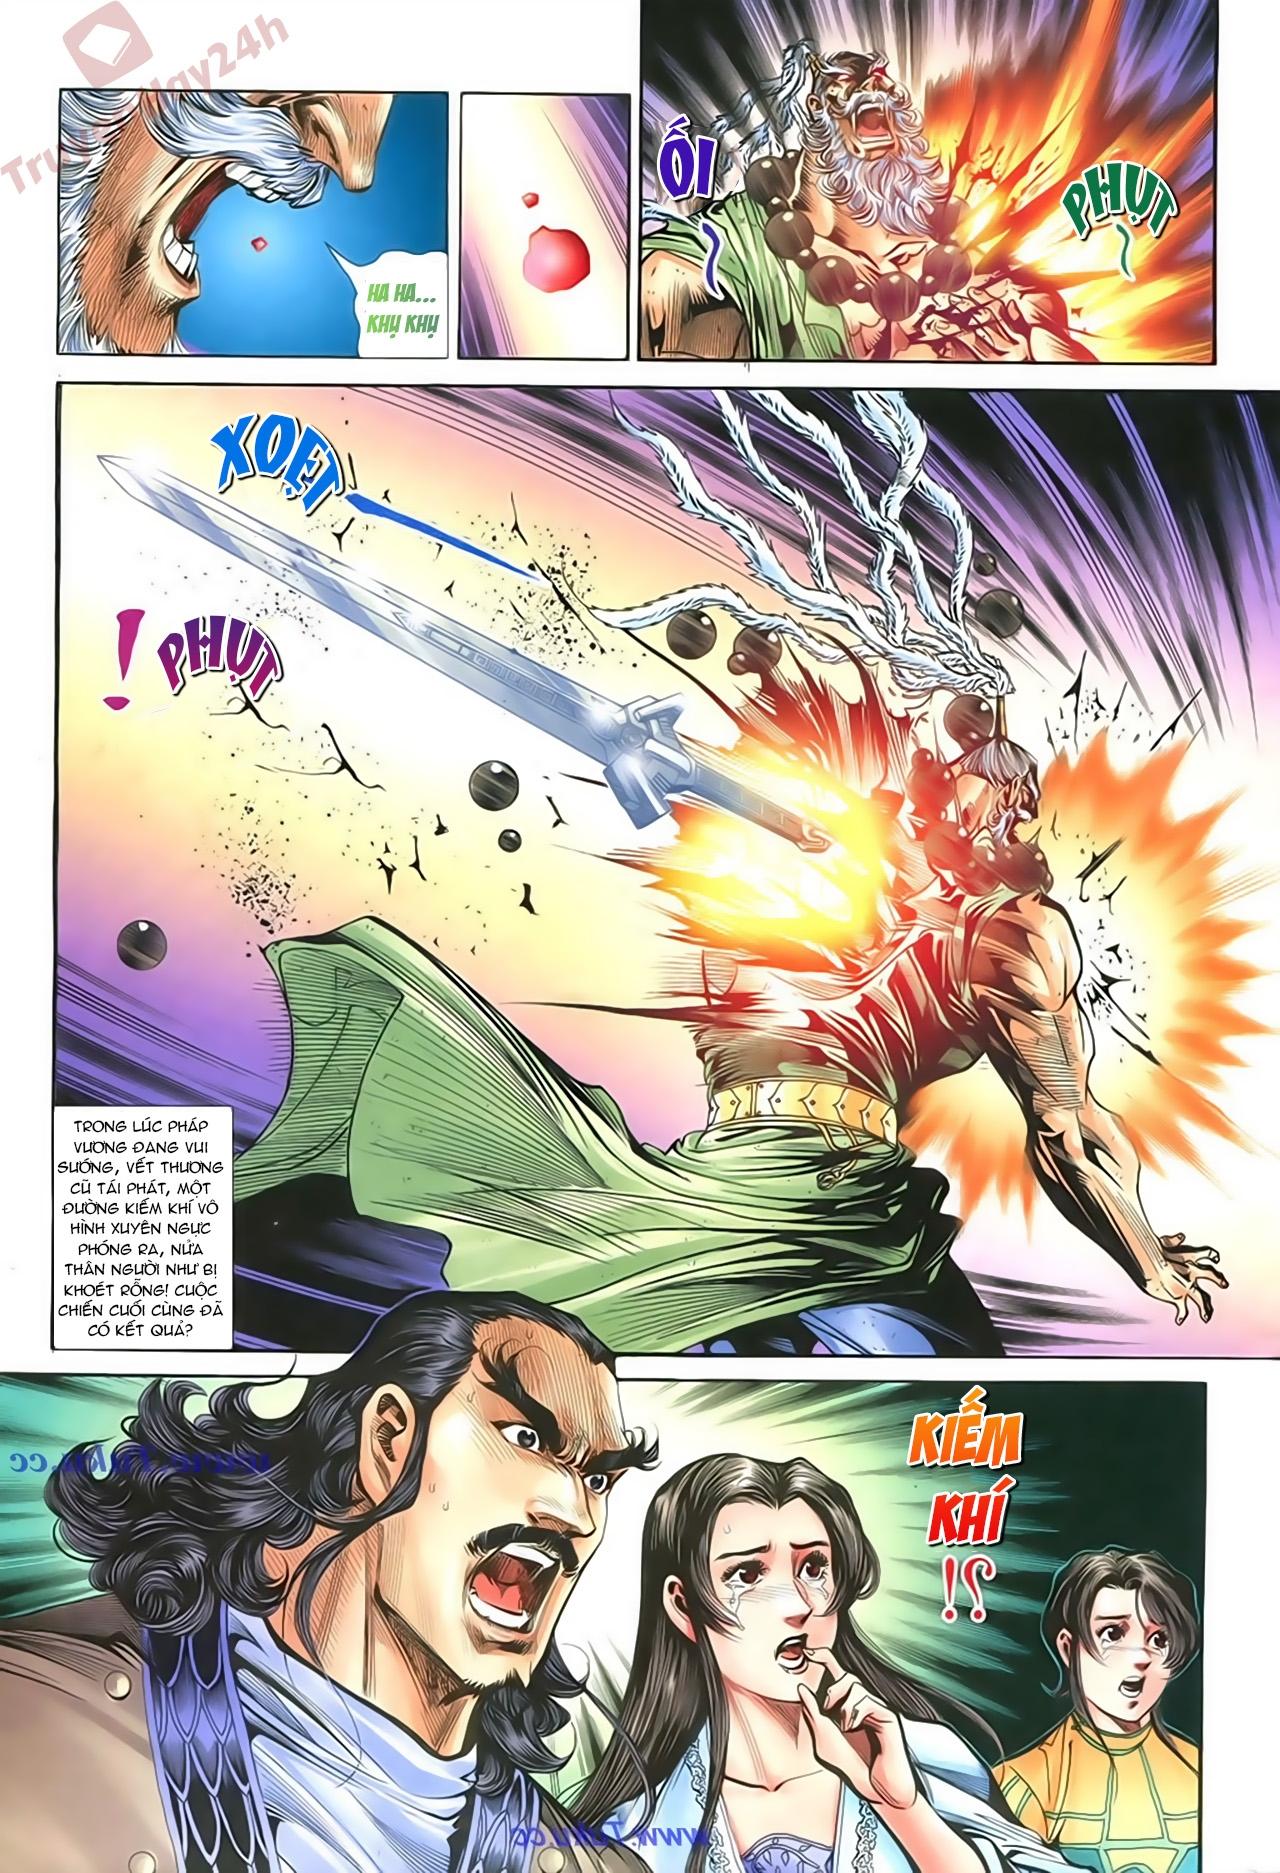 Thần Điêu Hiệp Lữ chap 86 – End Trang 31 - Mangak.info